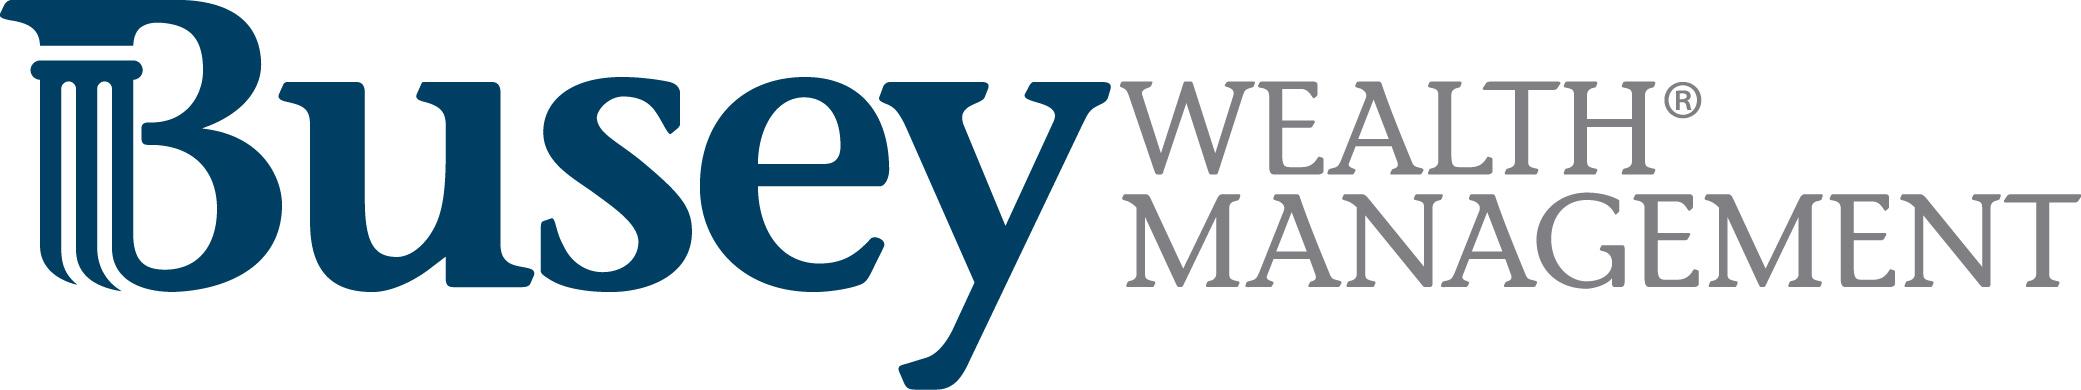 Busey Wealth Management